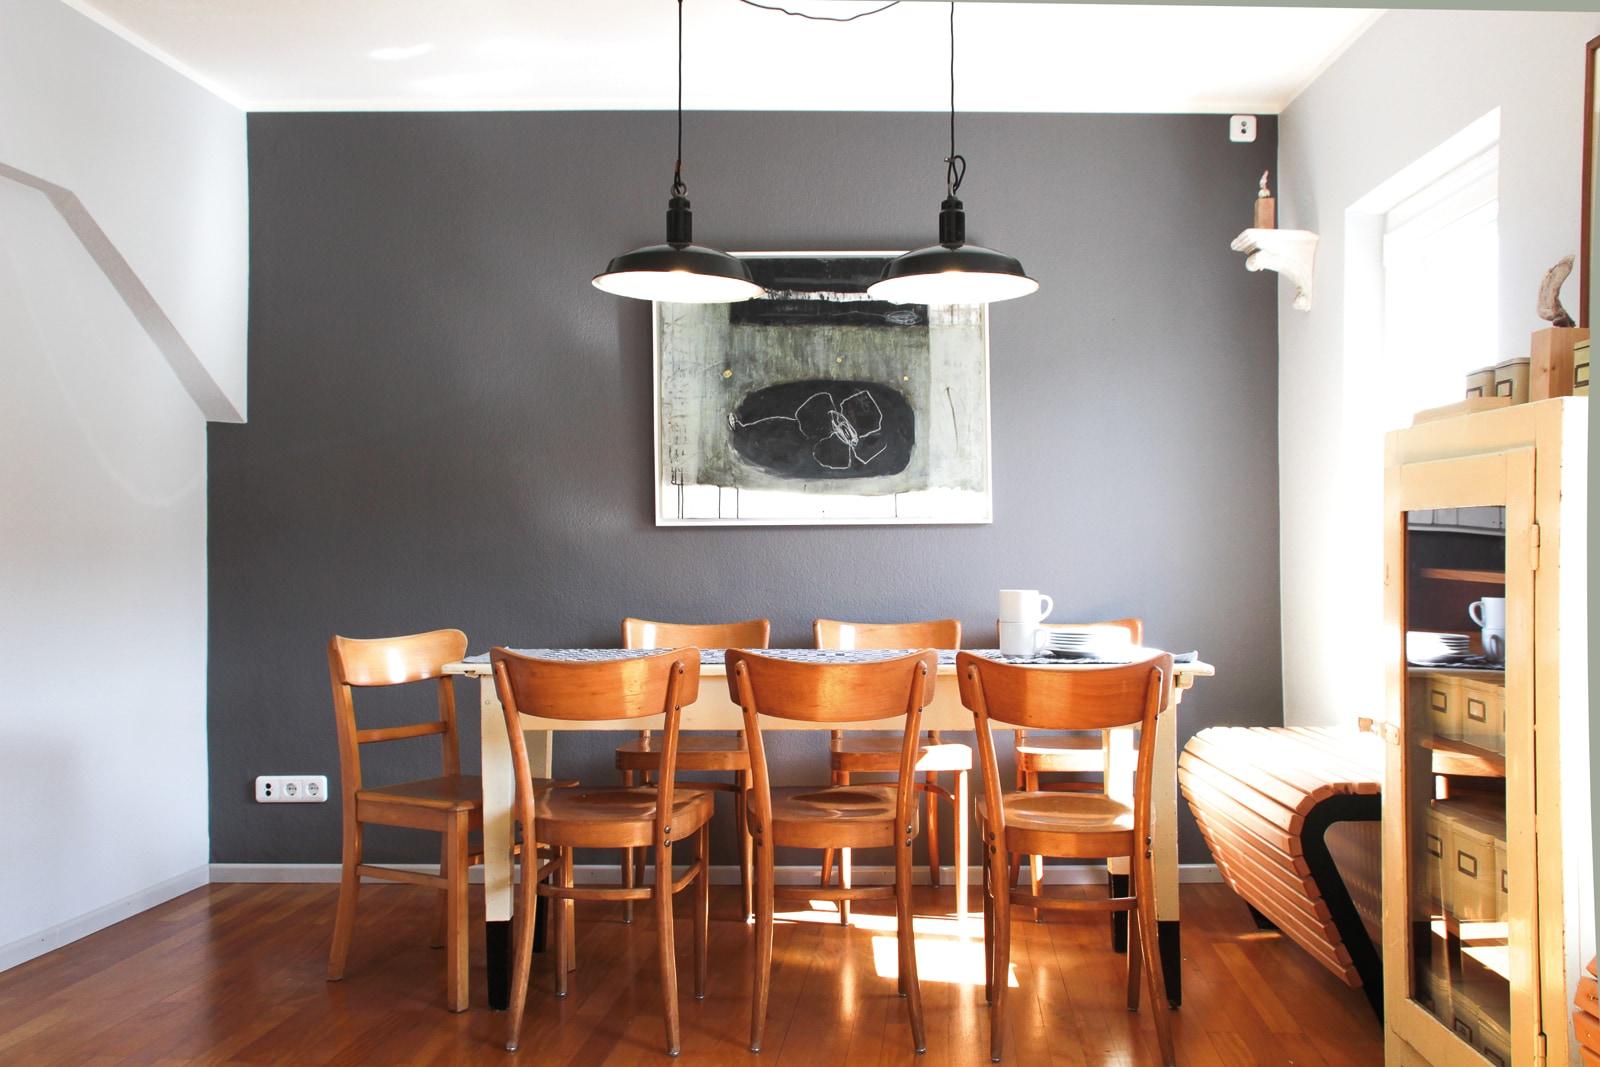 VIA-Kreidefarbe-512-Wollweiss-Wand-links